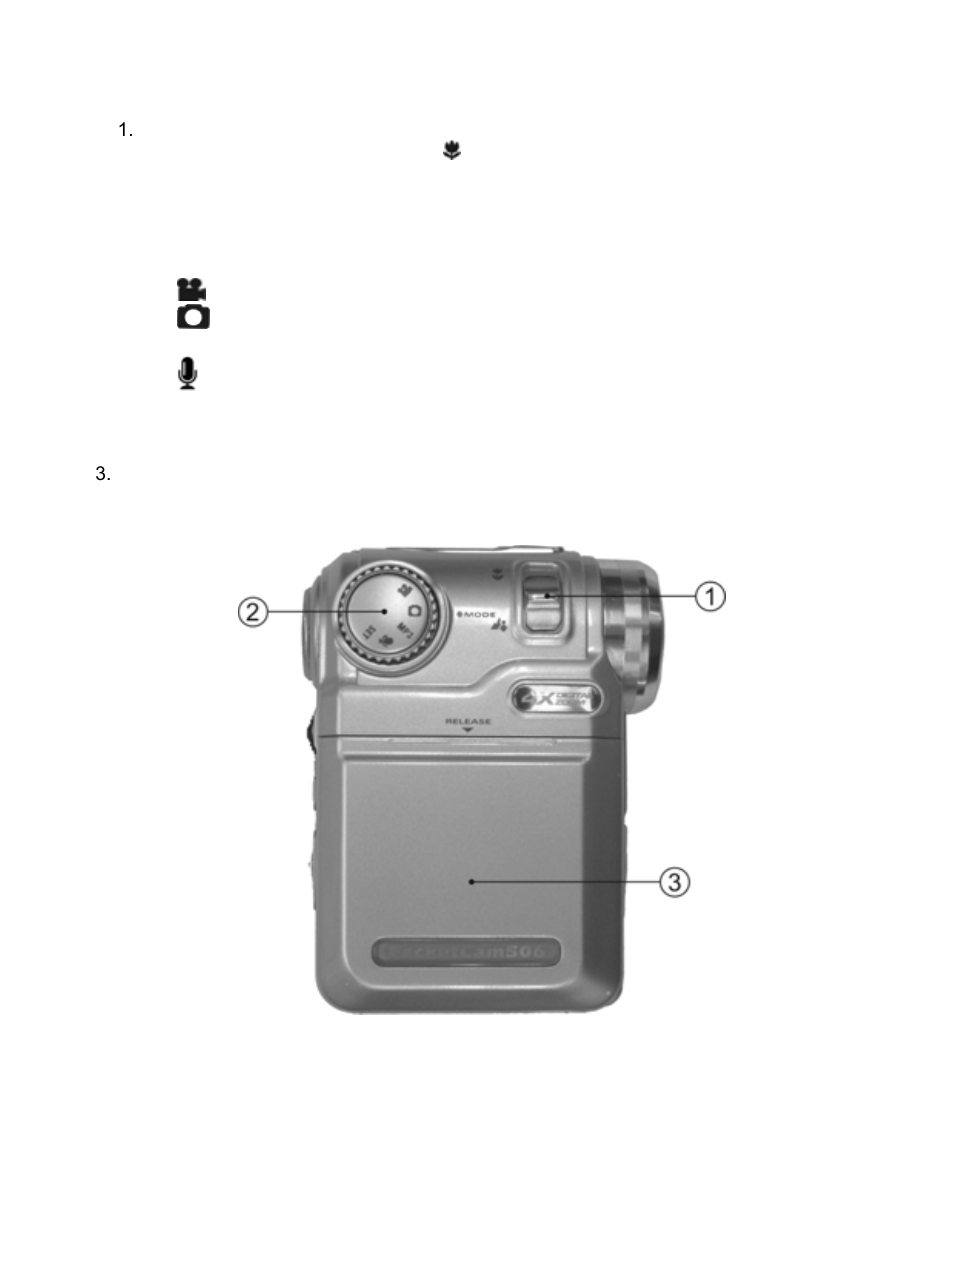 dxg technology dxg 506v user manual page 10 50 rh manualsdir com